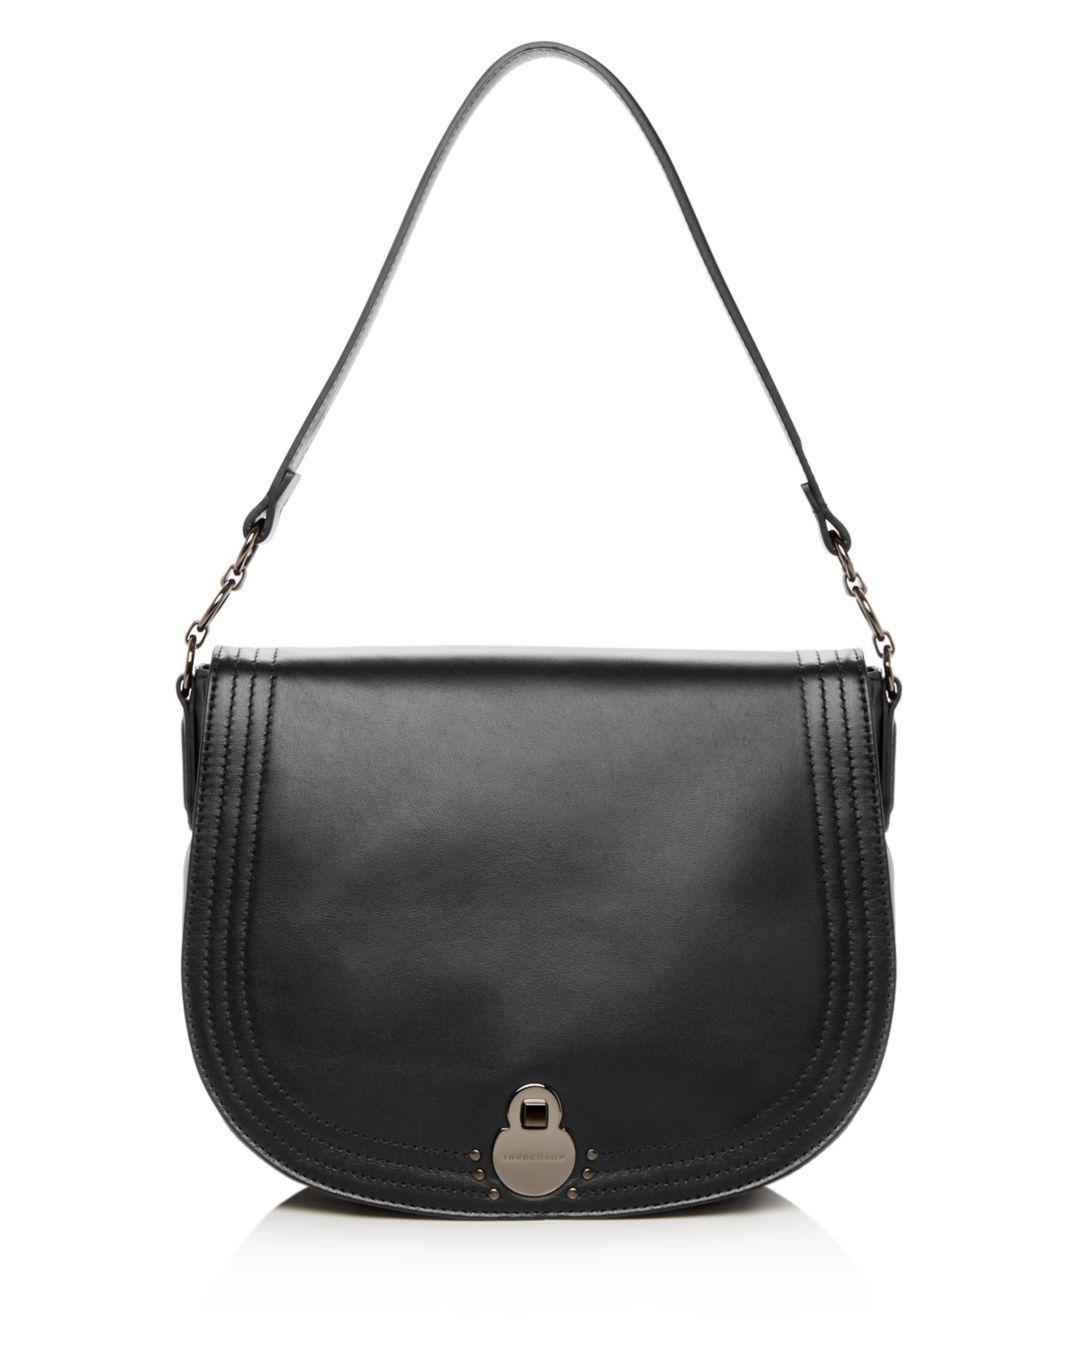 Lyst - Longchamp Cavalcade Large Leather Shoulder Bag in Black 0b5b512cd17cc